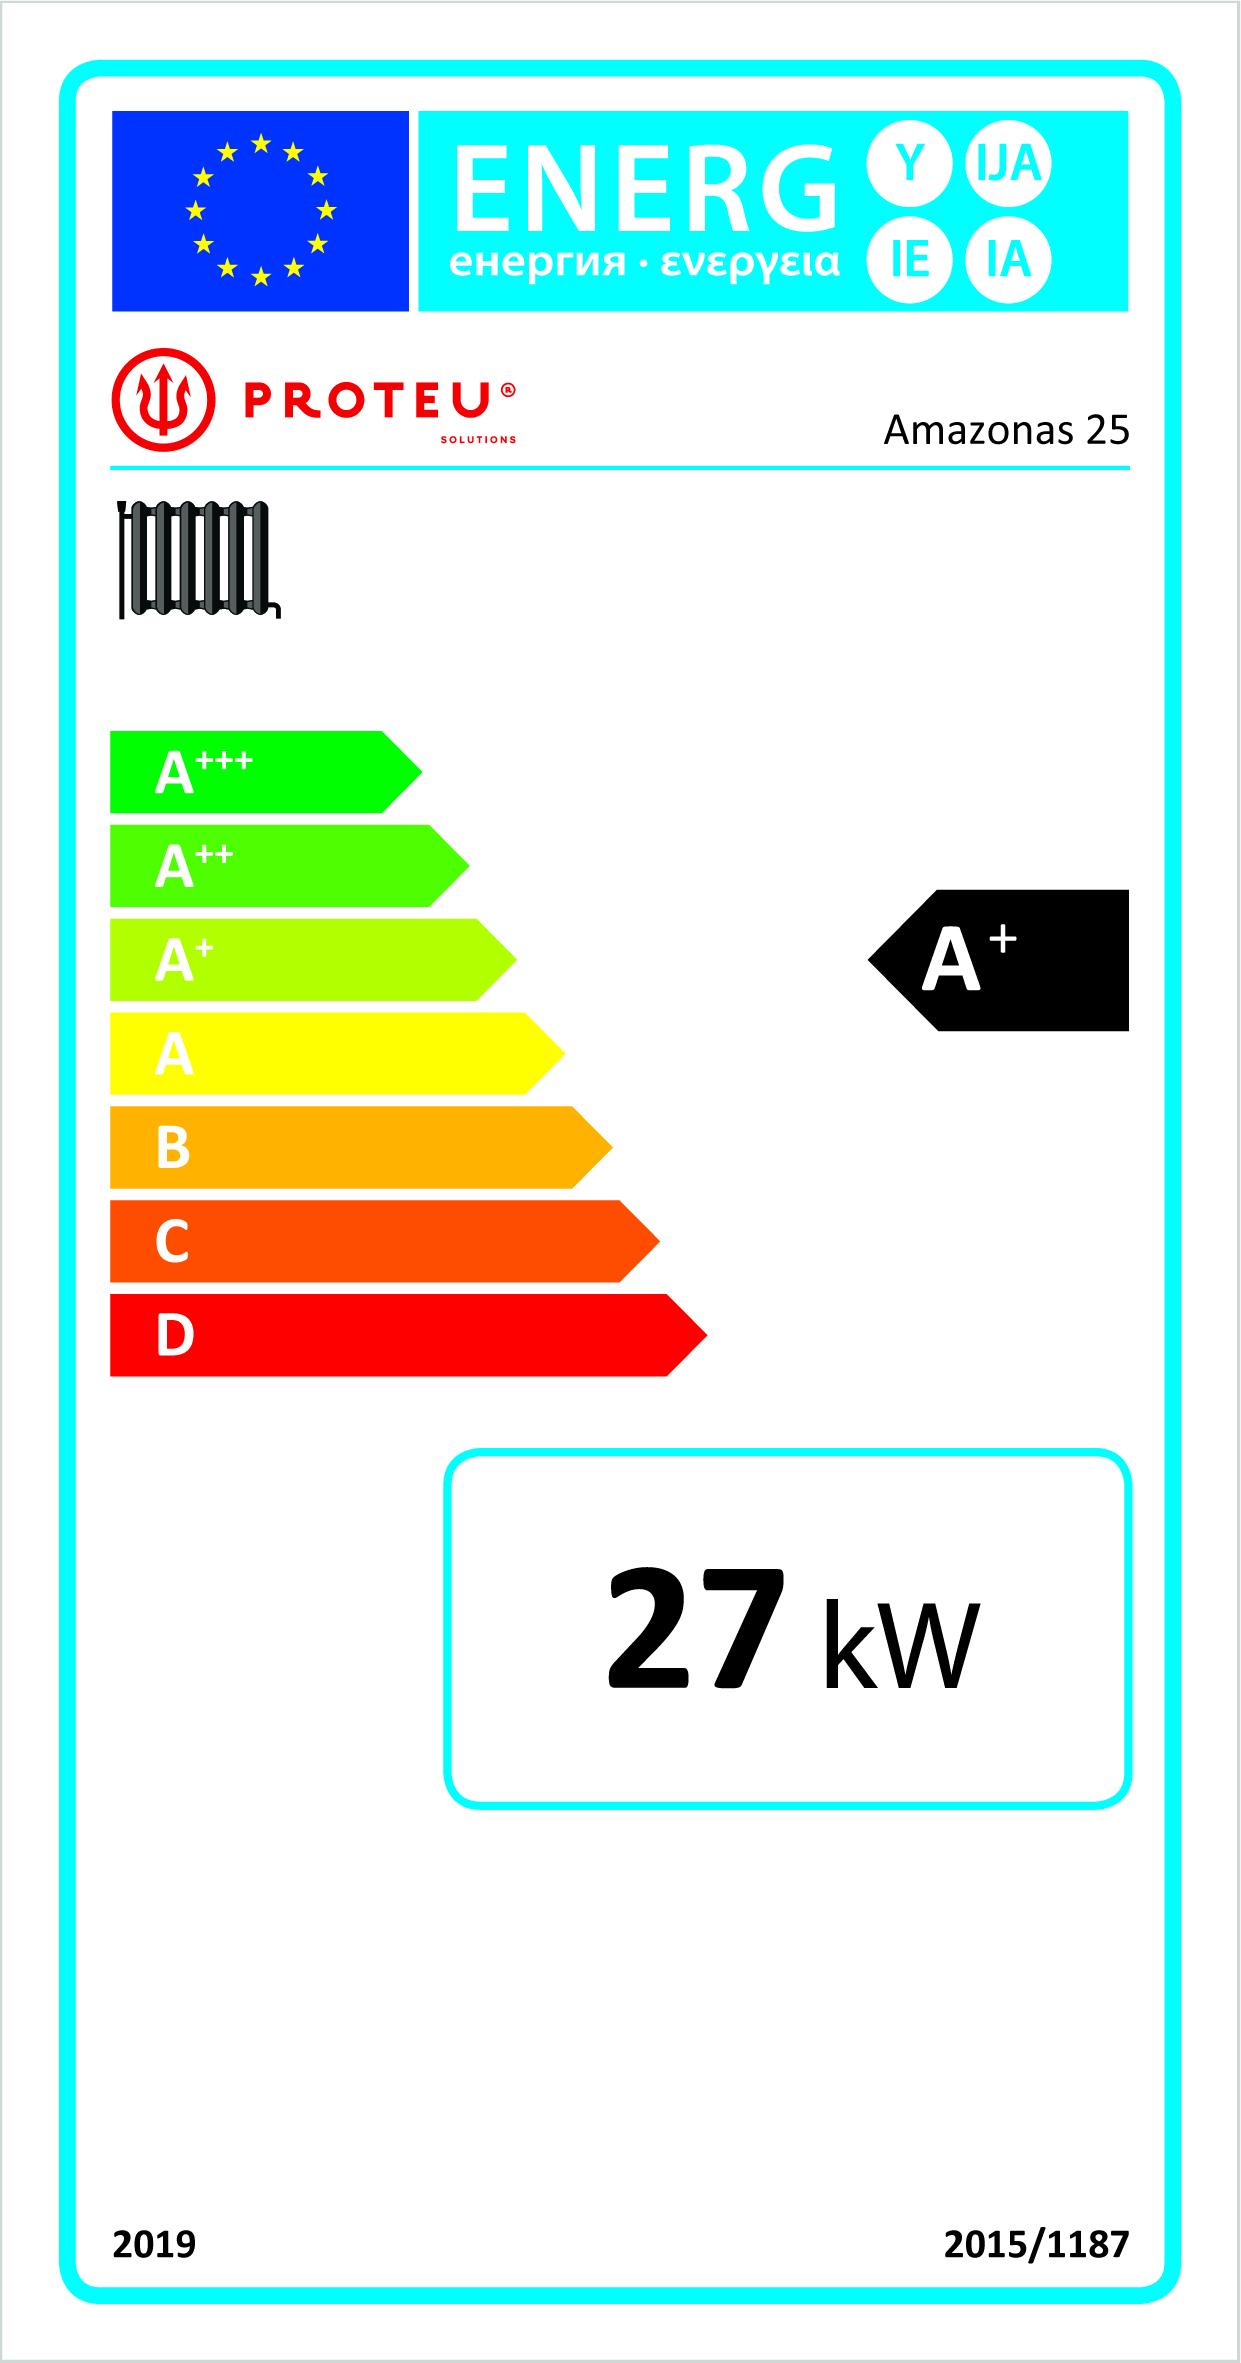 Etiqueta energética amazonas 25